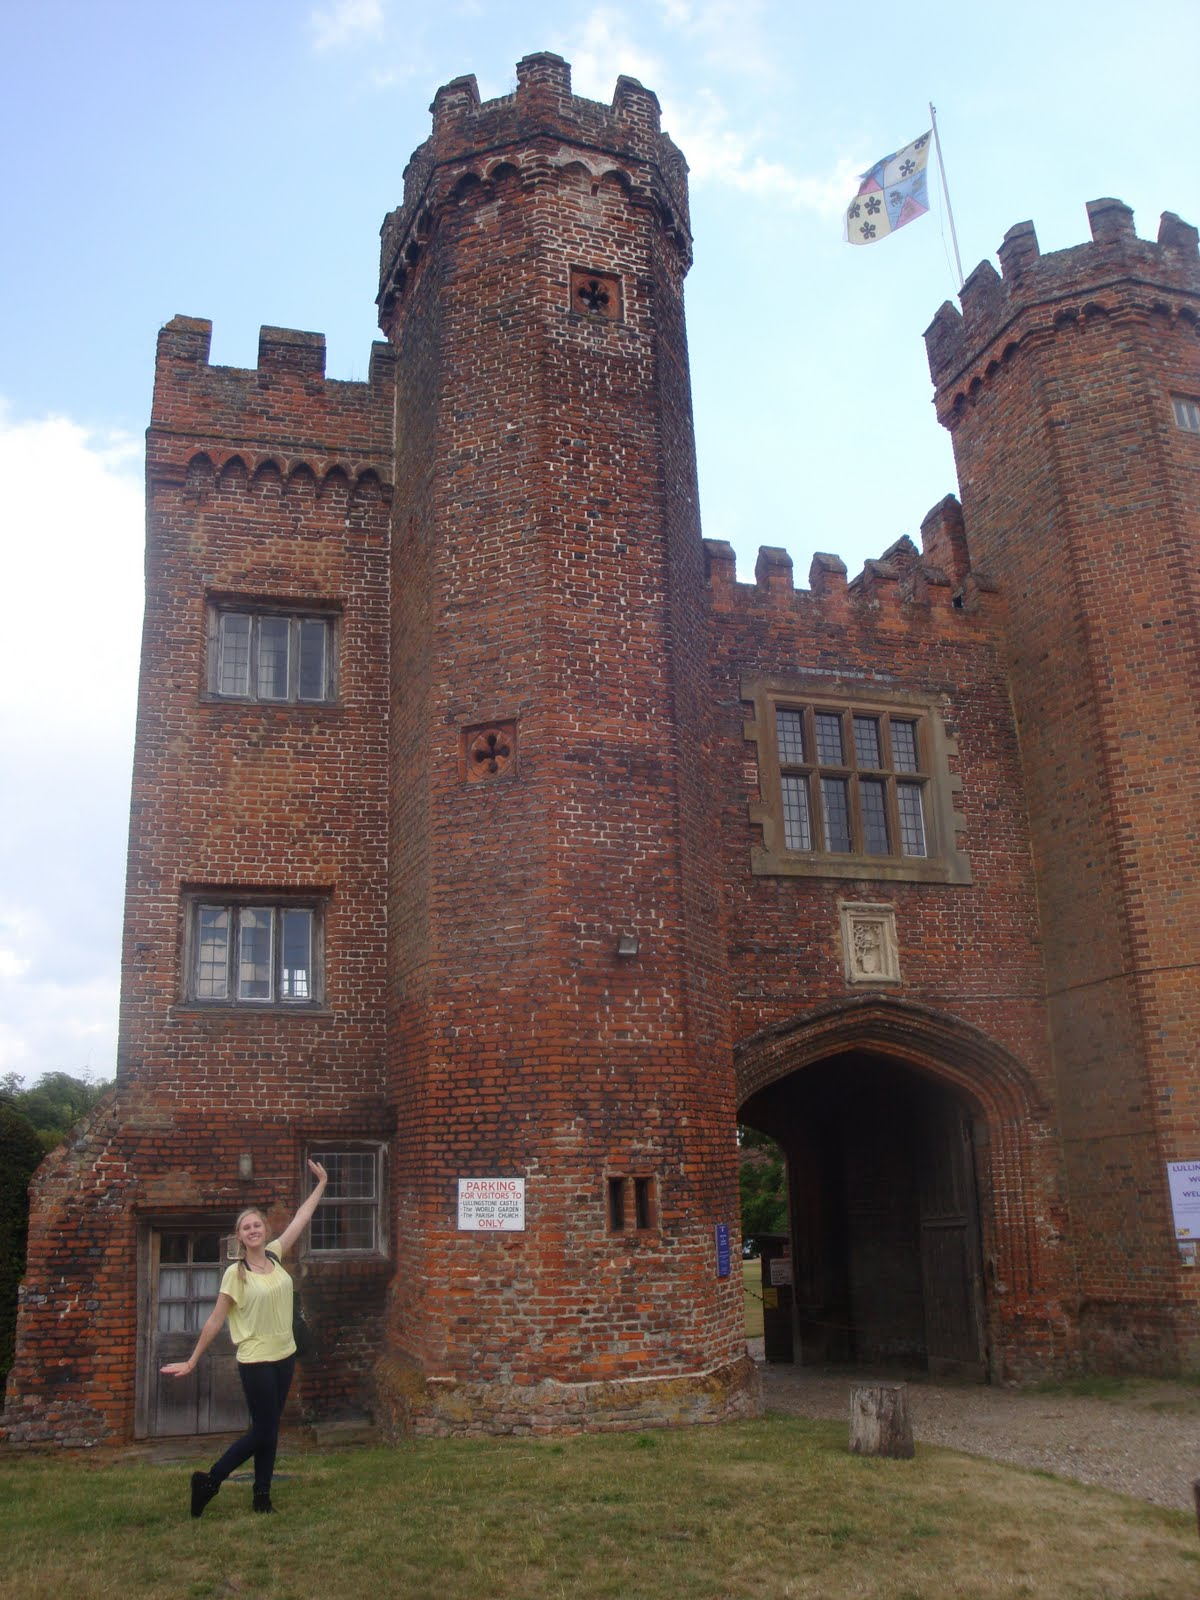 I have a castle problem.